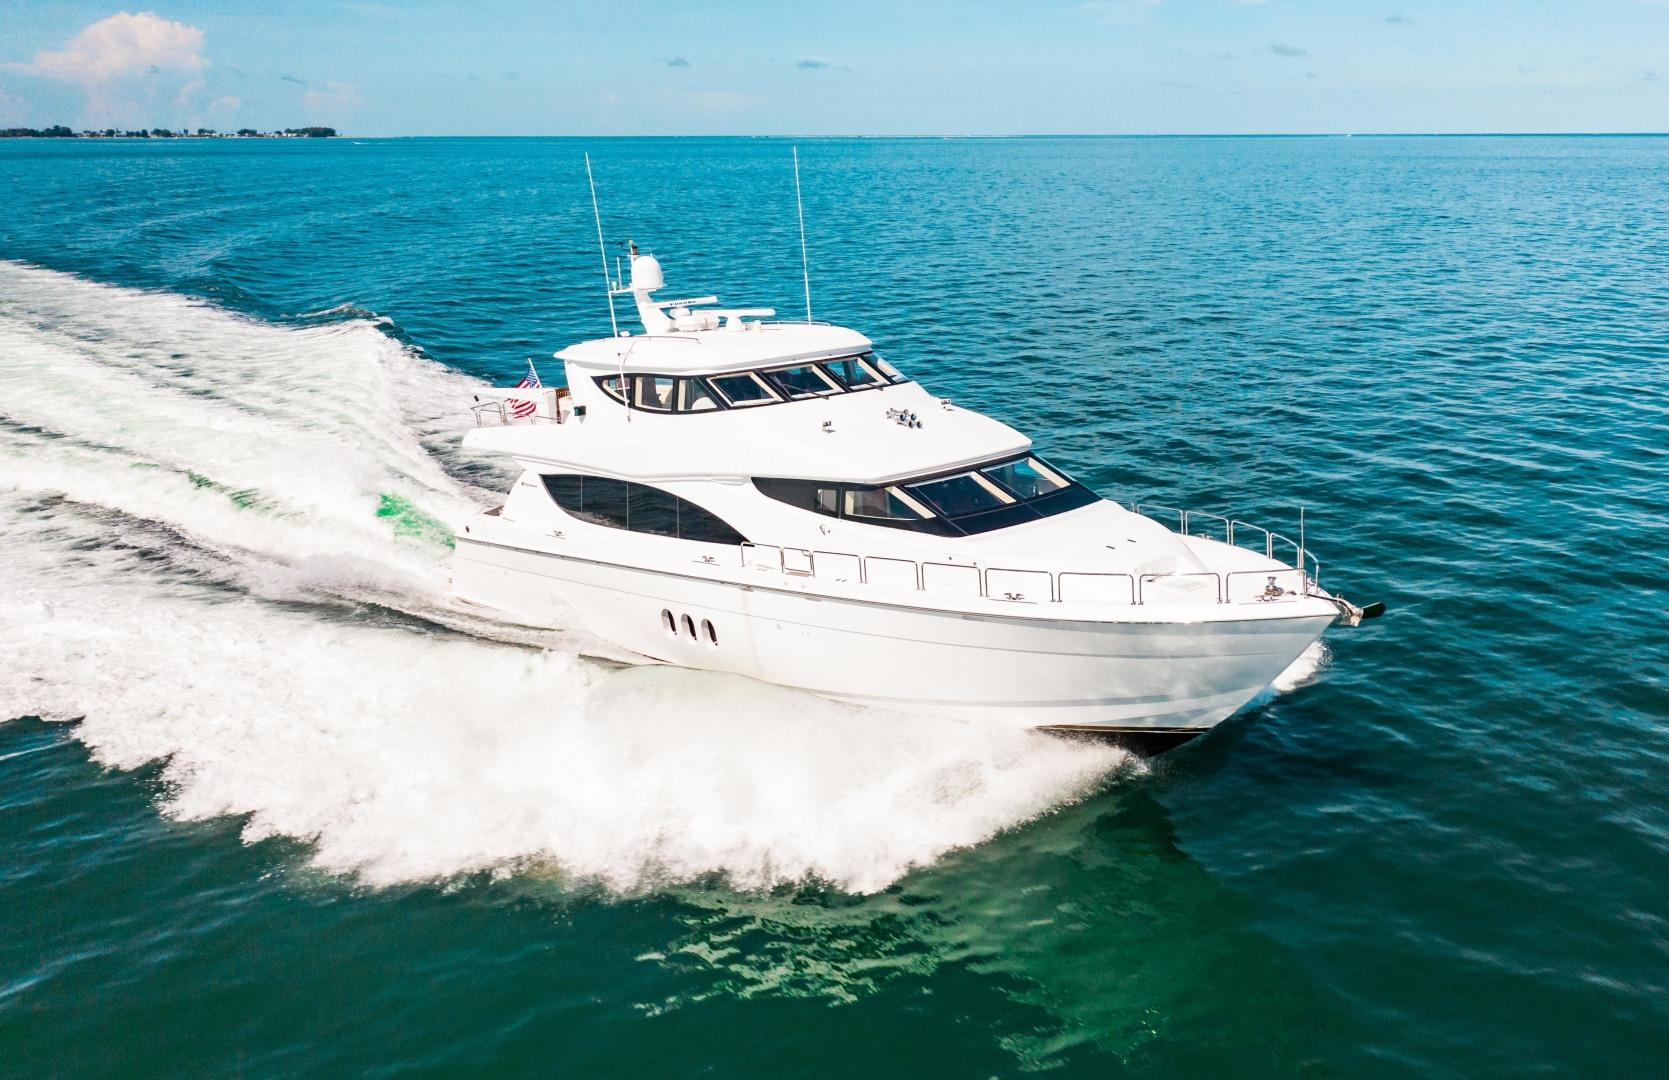 Hatteras-80 Motor Yacht 2008-Galati Yacht Sales Trade Anna Maria-Florida-United States-2008 Hatteras 80 Motor Yacht  Galati Yacht Sales Trade-1466271 | Thumbnail